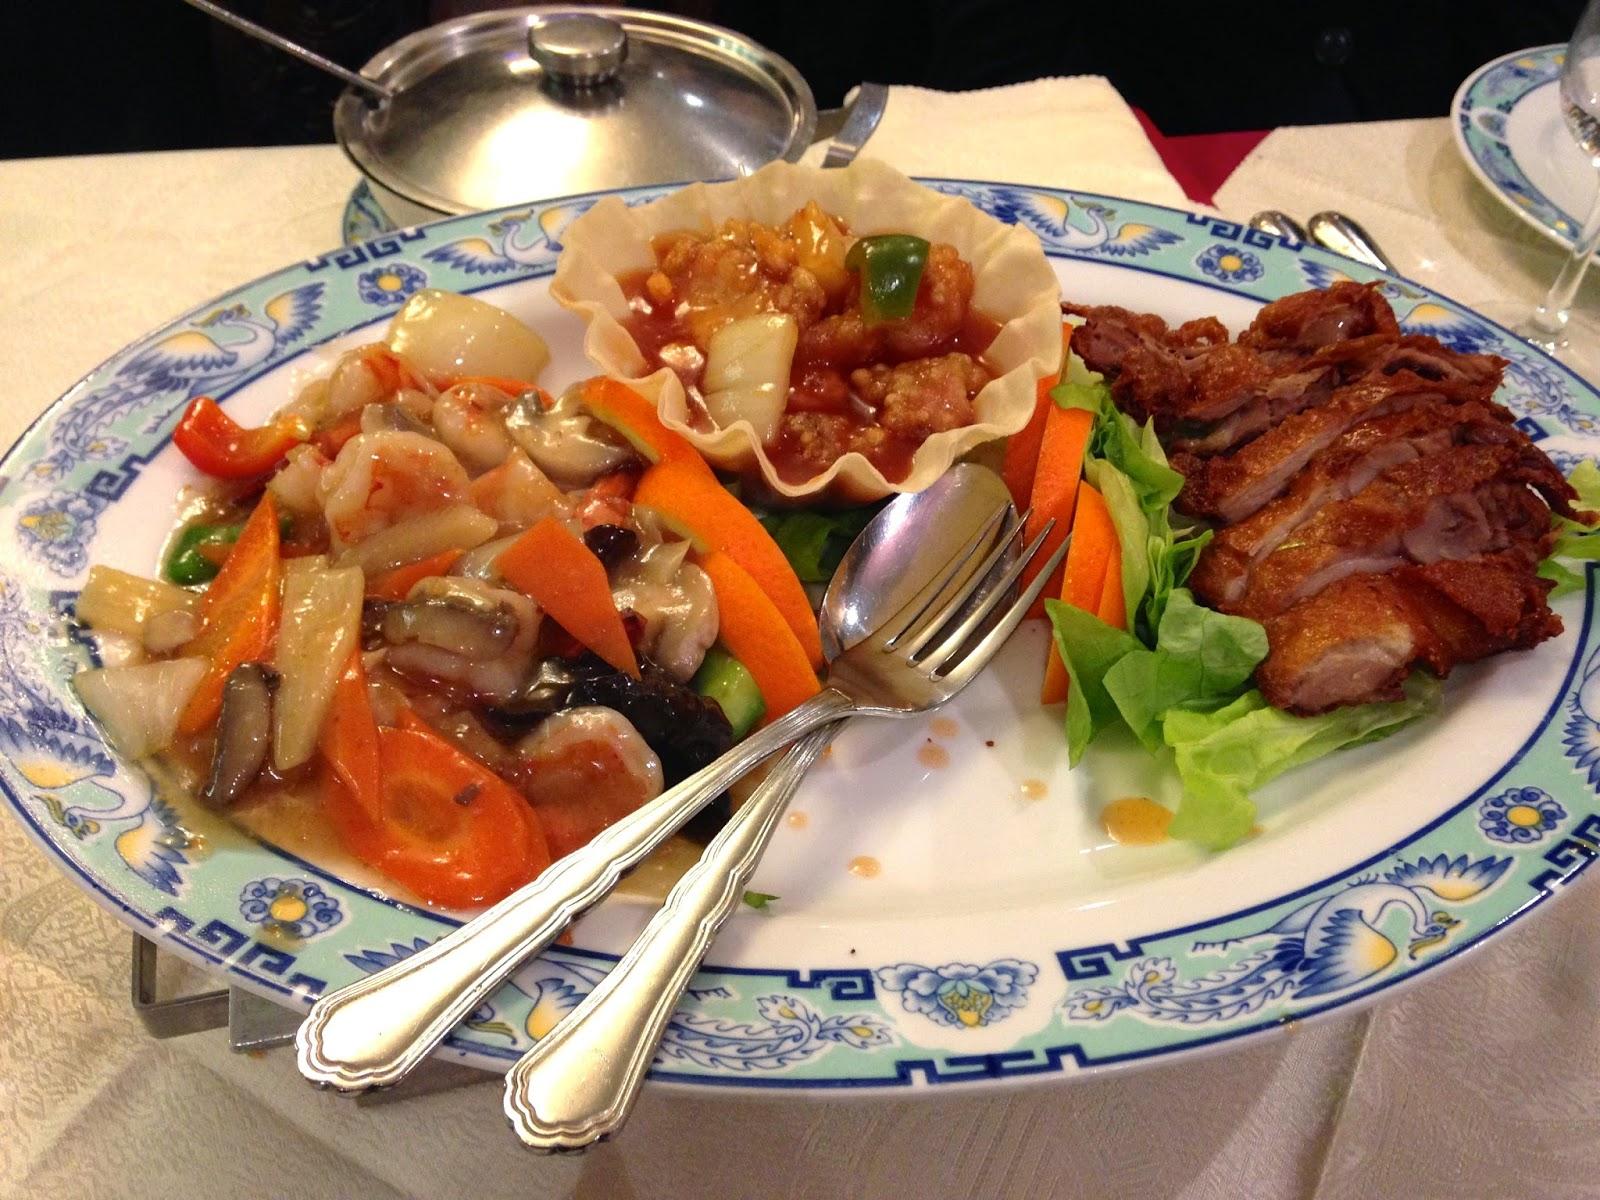 Restaurant Chinois Buffet A Volonte Montpellier